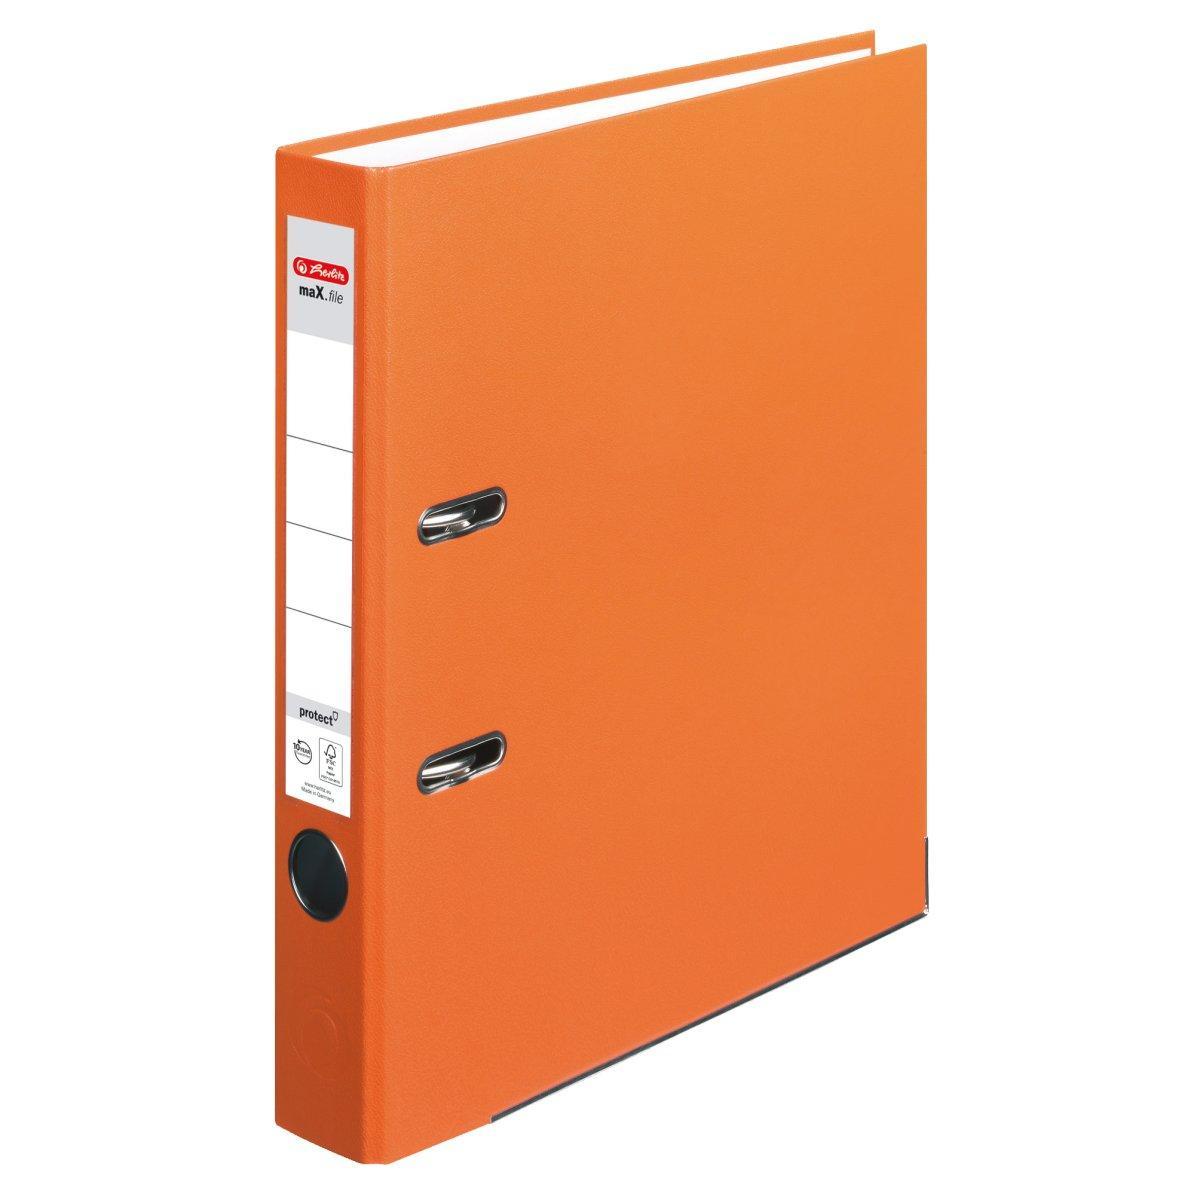 Папка-регистратор Herlitz А4 5см Protect оранжевая